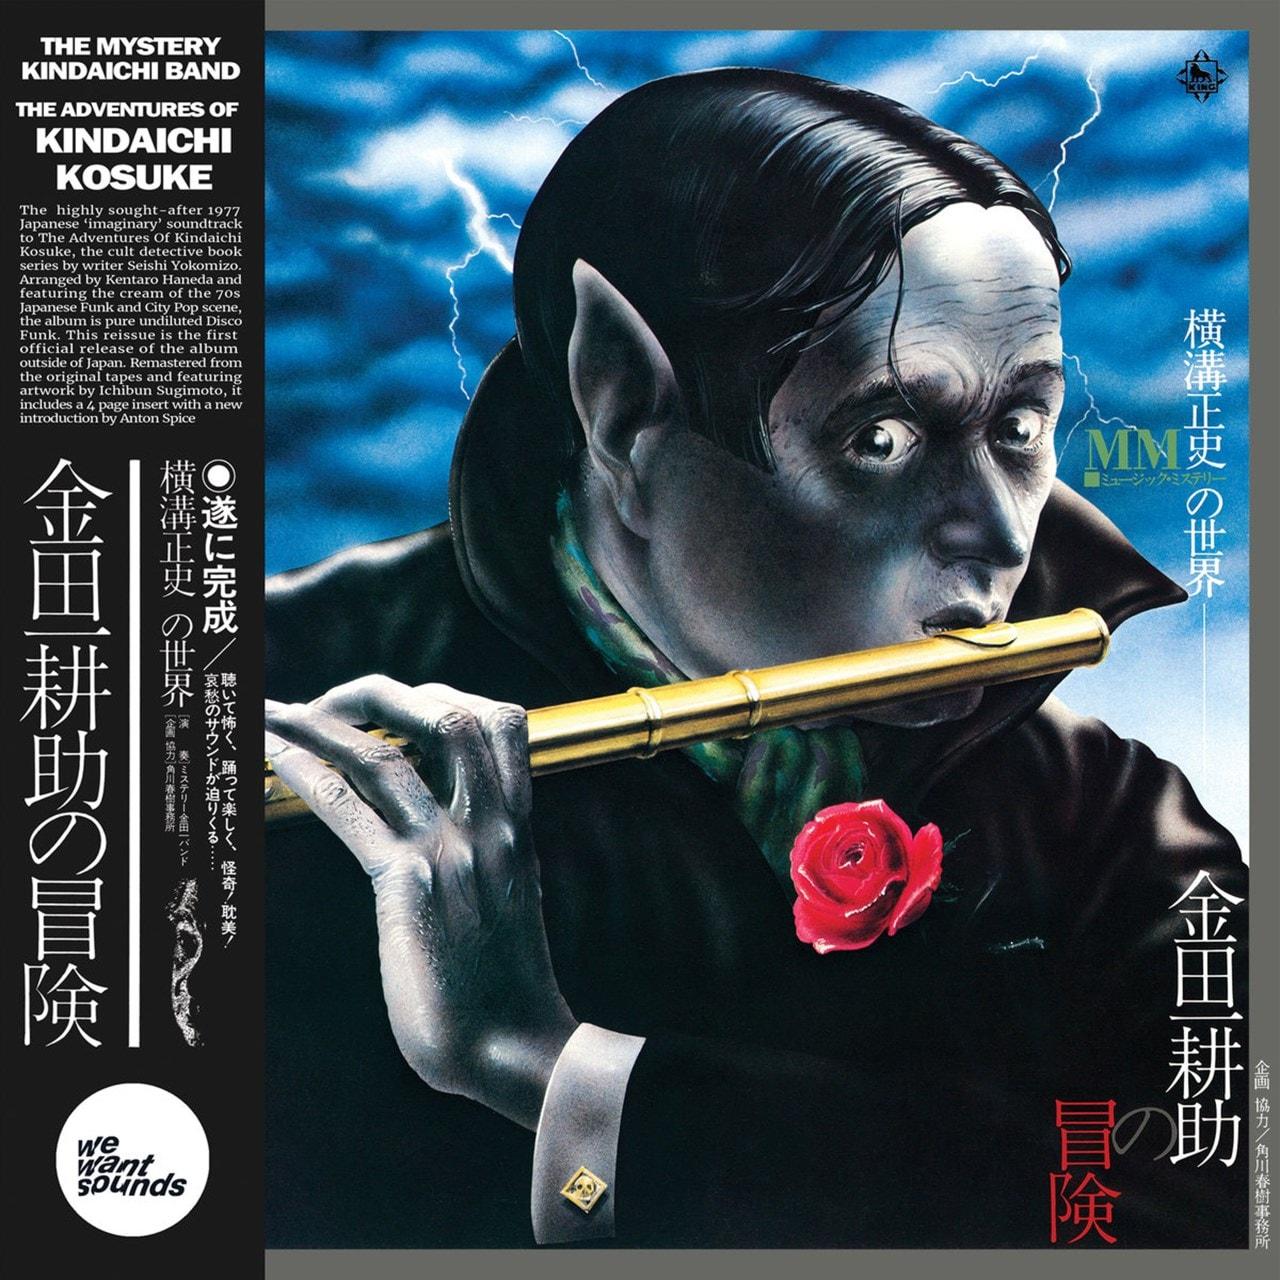 The Adventures of Kindaichi Kosuke - 1